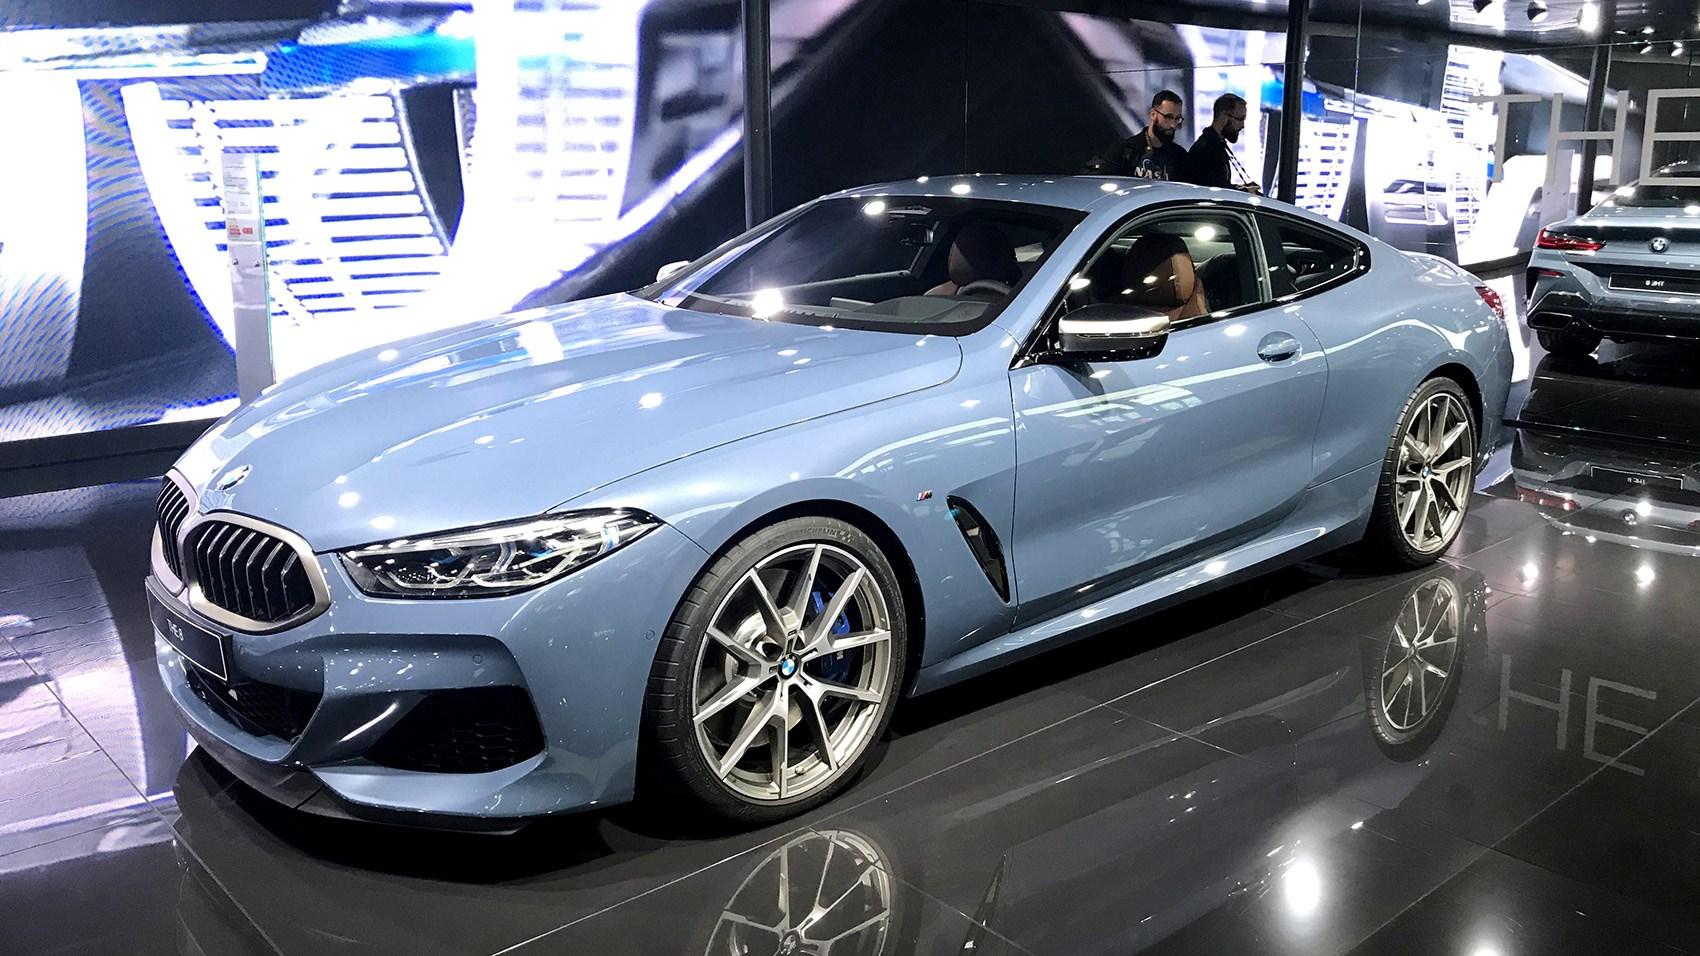 New BMW Series Unveiled In Paris CAR Magazine - Goodwood hardware car show